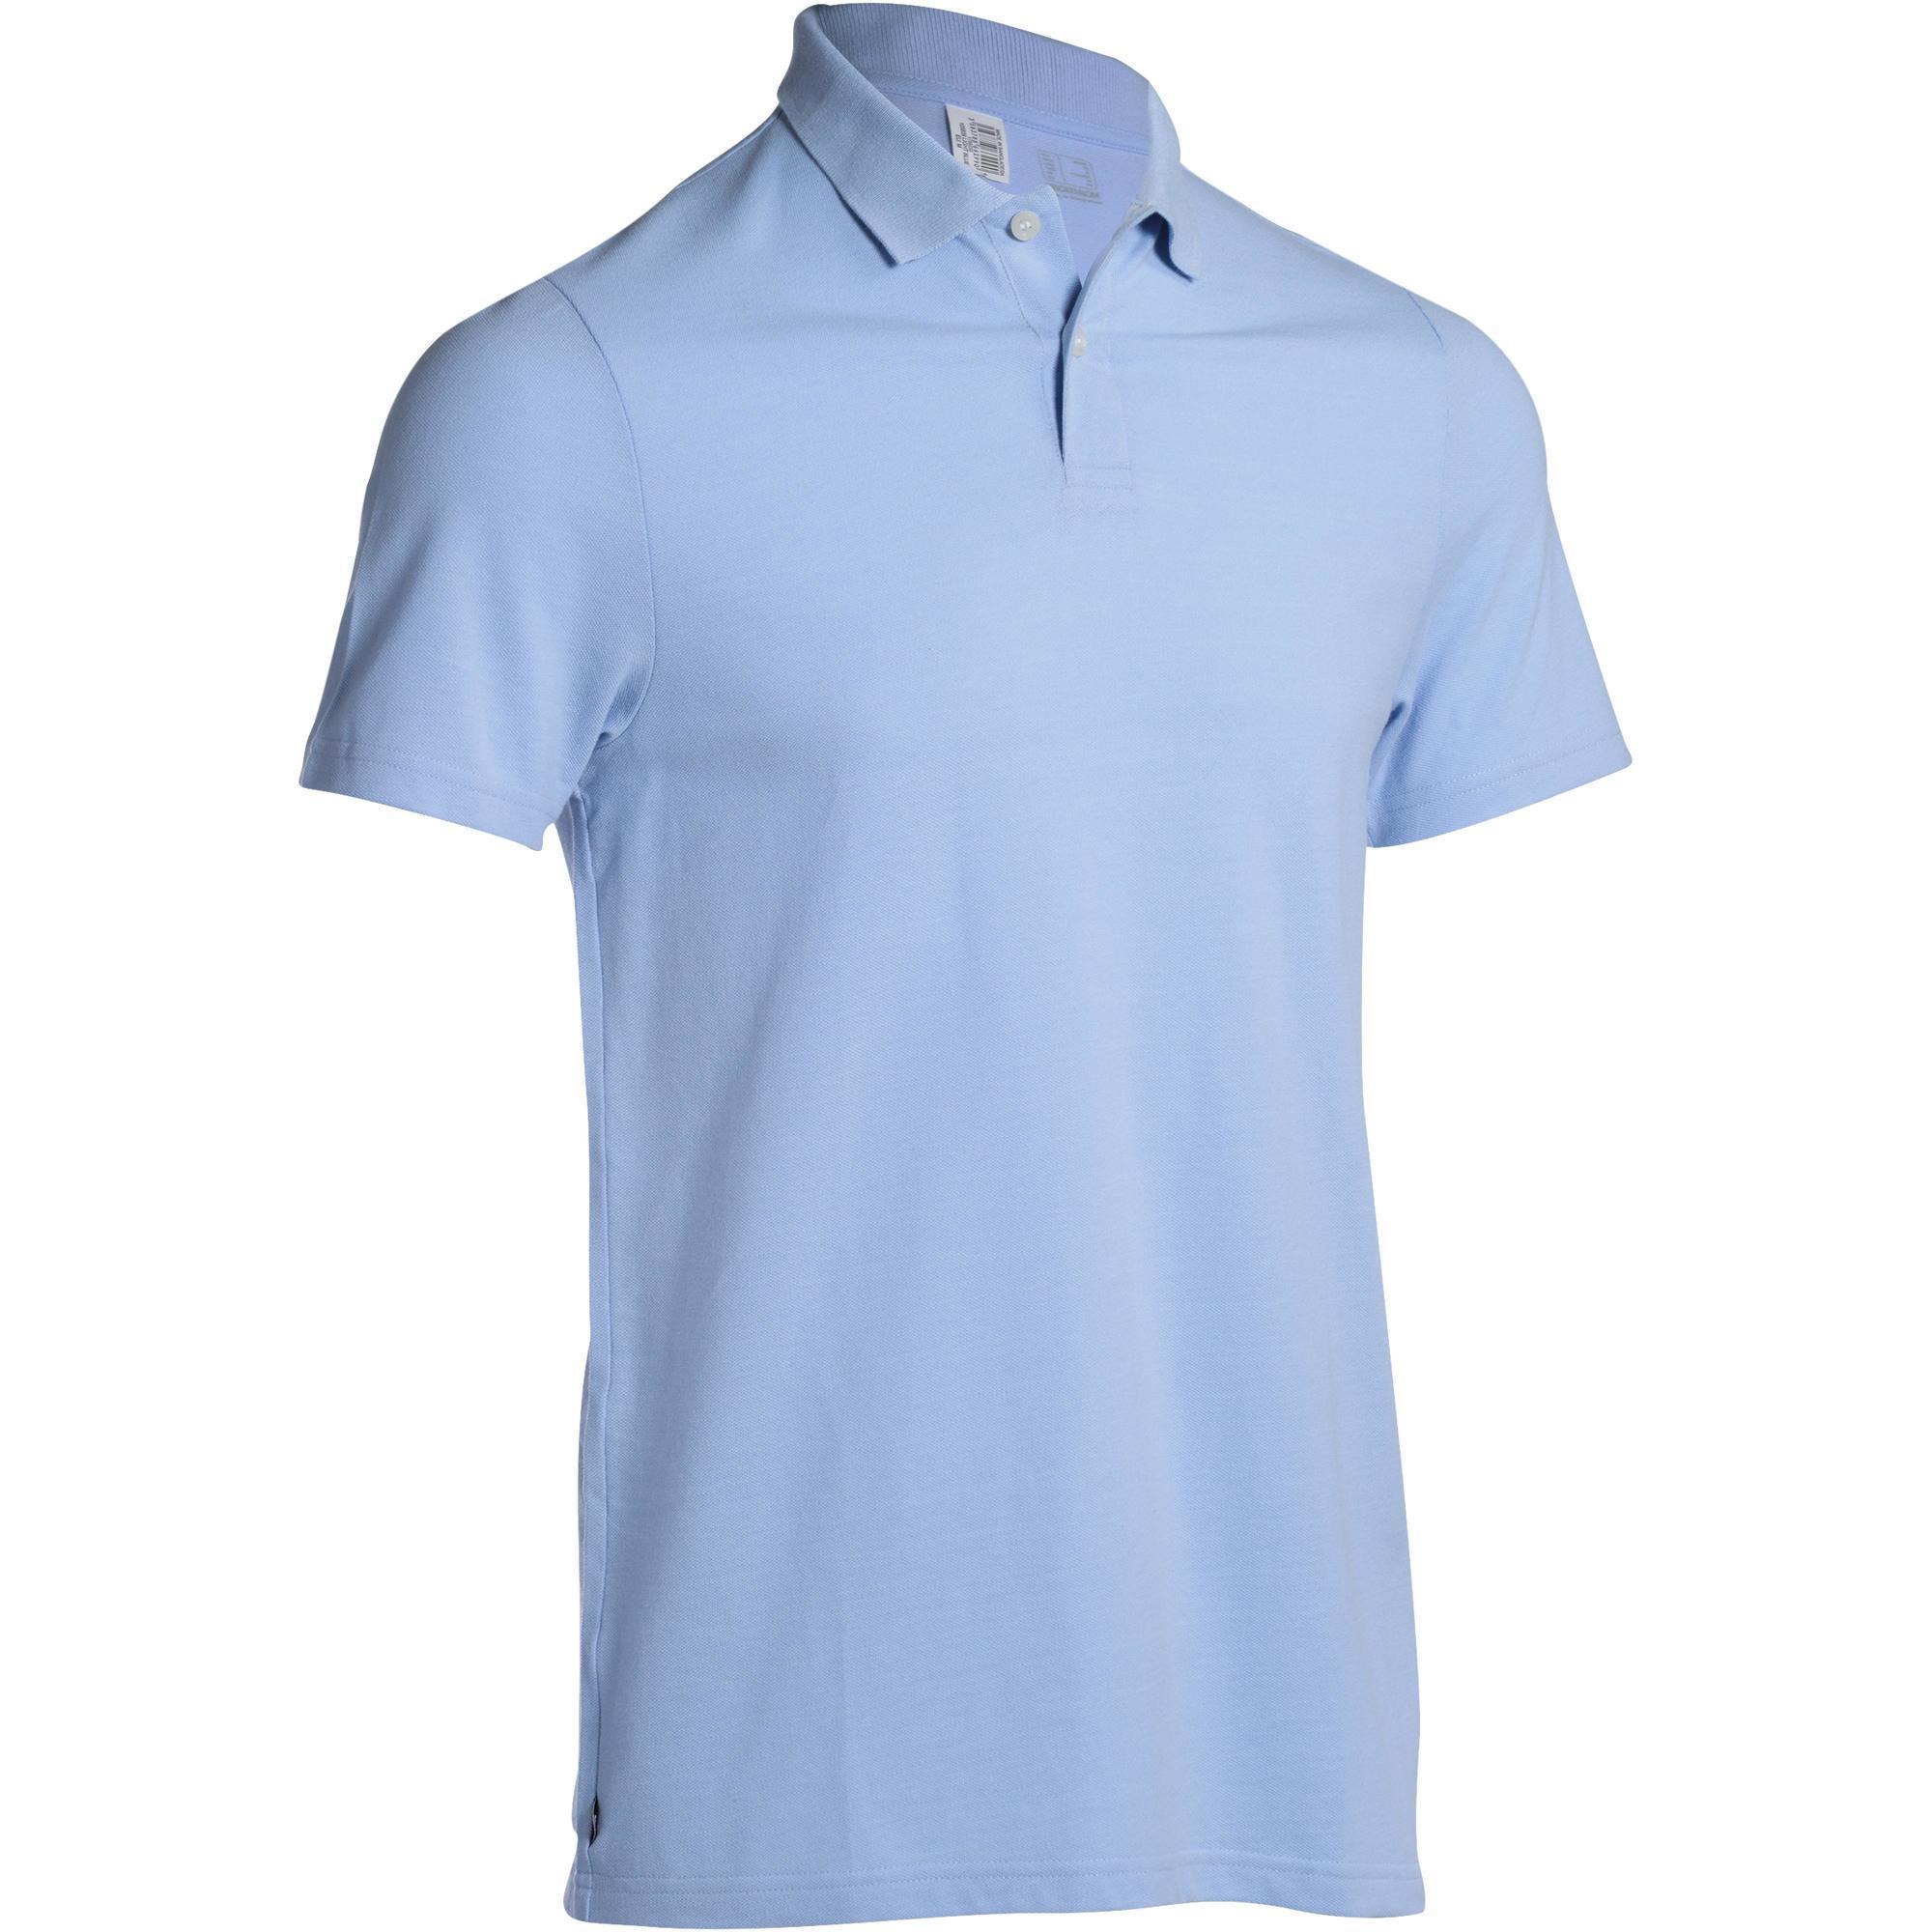 polo de golf homme manches courtes 100 temps temp r bleu ciel inesis golf. Black Bedroom Furniture Sets. Home Design Ideas